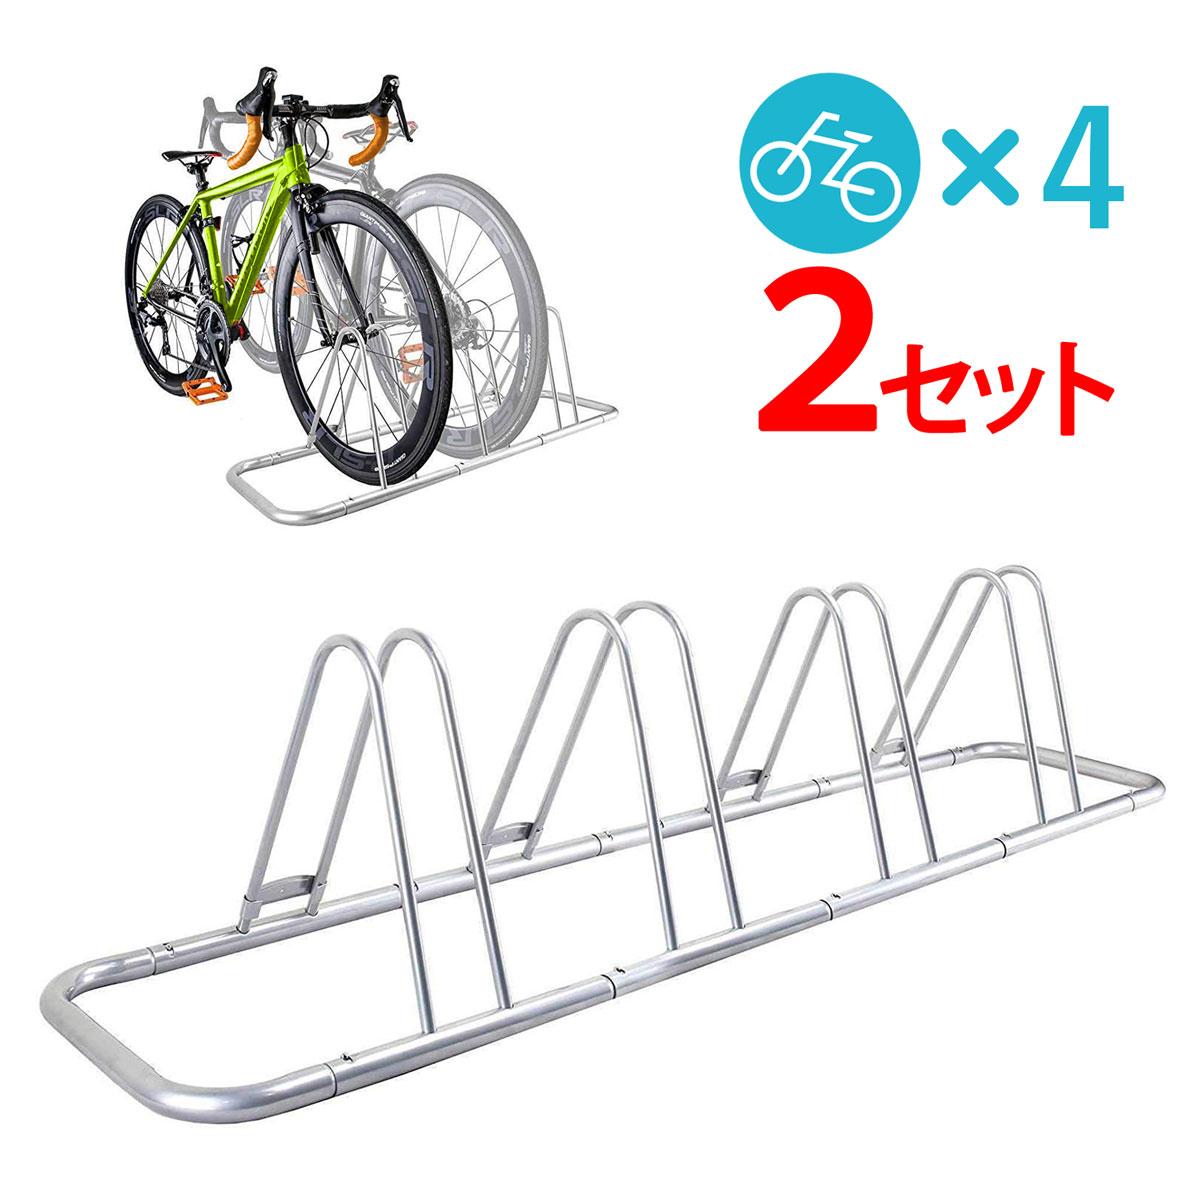 【B122】【2個セット】最大4台用自転車スタンド NinoLite 直角 又は 斜め収納でスペース節約!自転車の多い方 会社用 店舗用にも大活躍! バイクスタンド サイクルパーキングラック 自転車ラック サイクルラック 駐輪ラック 4台タイプ 1台 2台 3台用にもアレンジ可能 最大8台